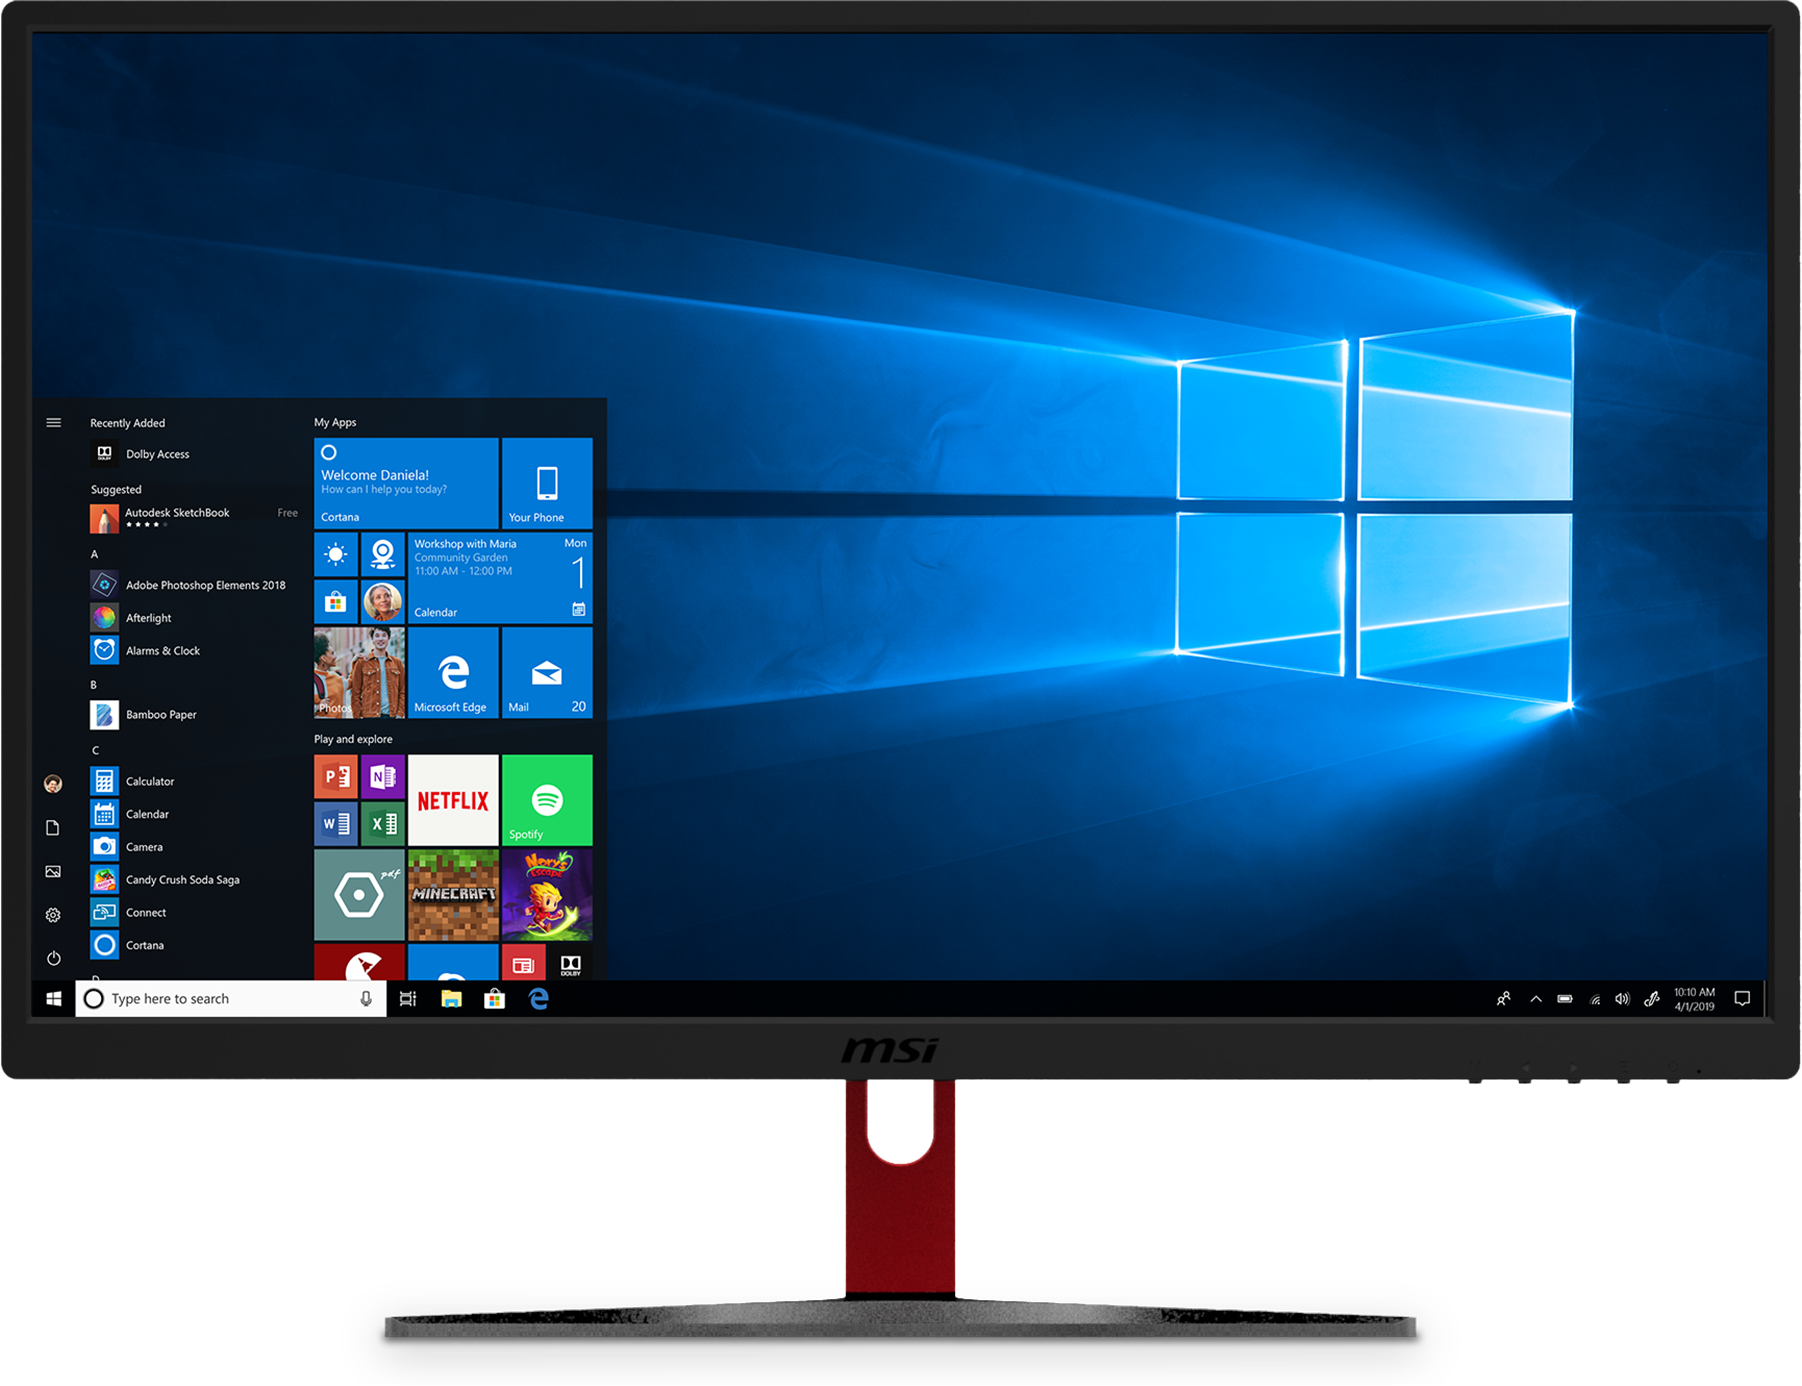 Buy MSI Optix G24C 24'' Monitor - Microsoft Store